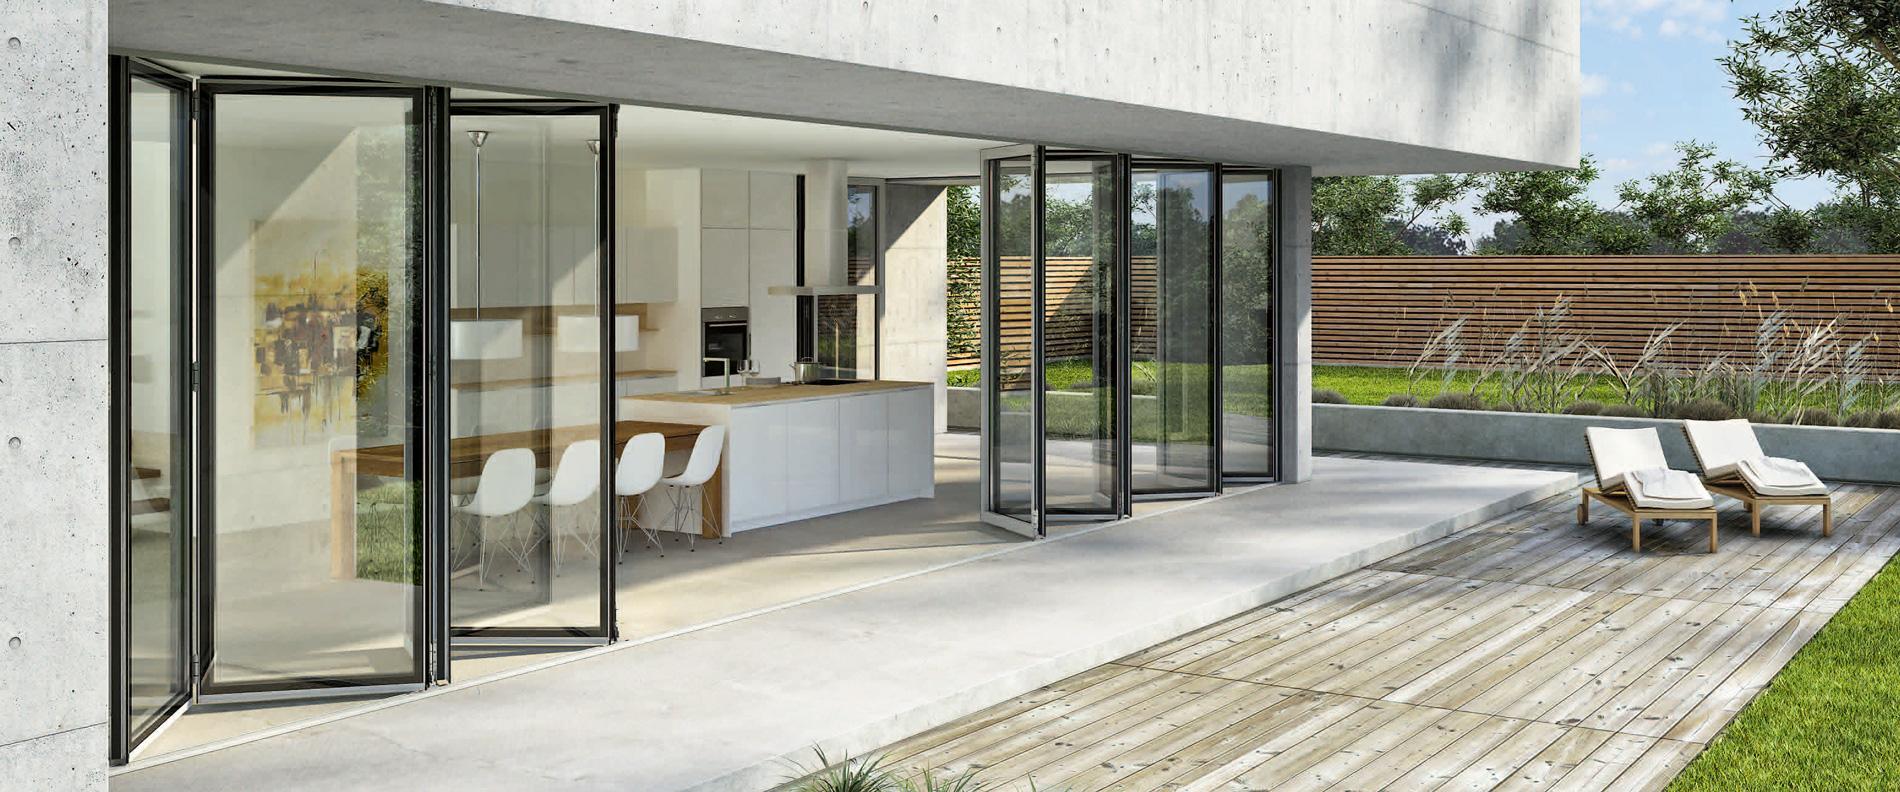 Faltanlagen toppm ller gmbh fenster haust ren for Fenster marken